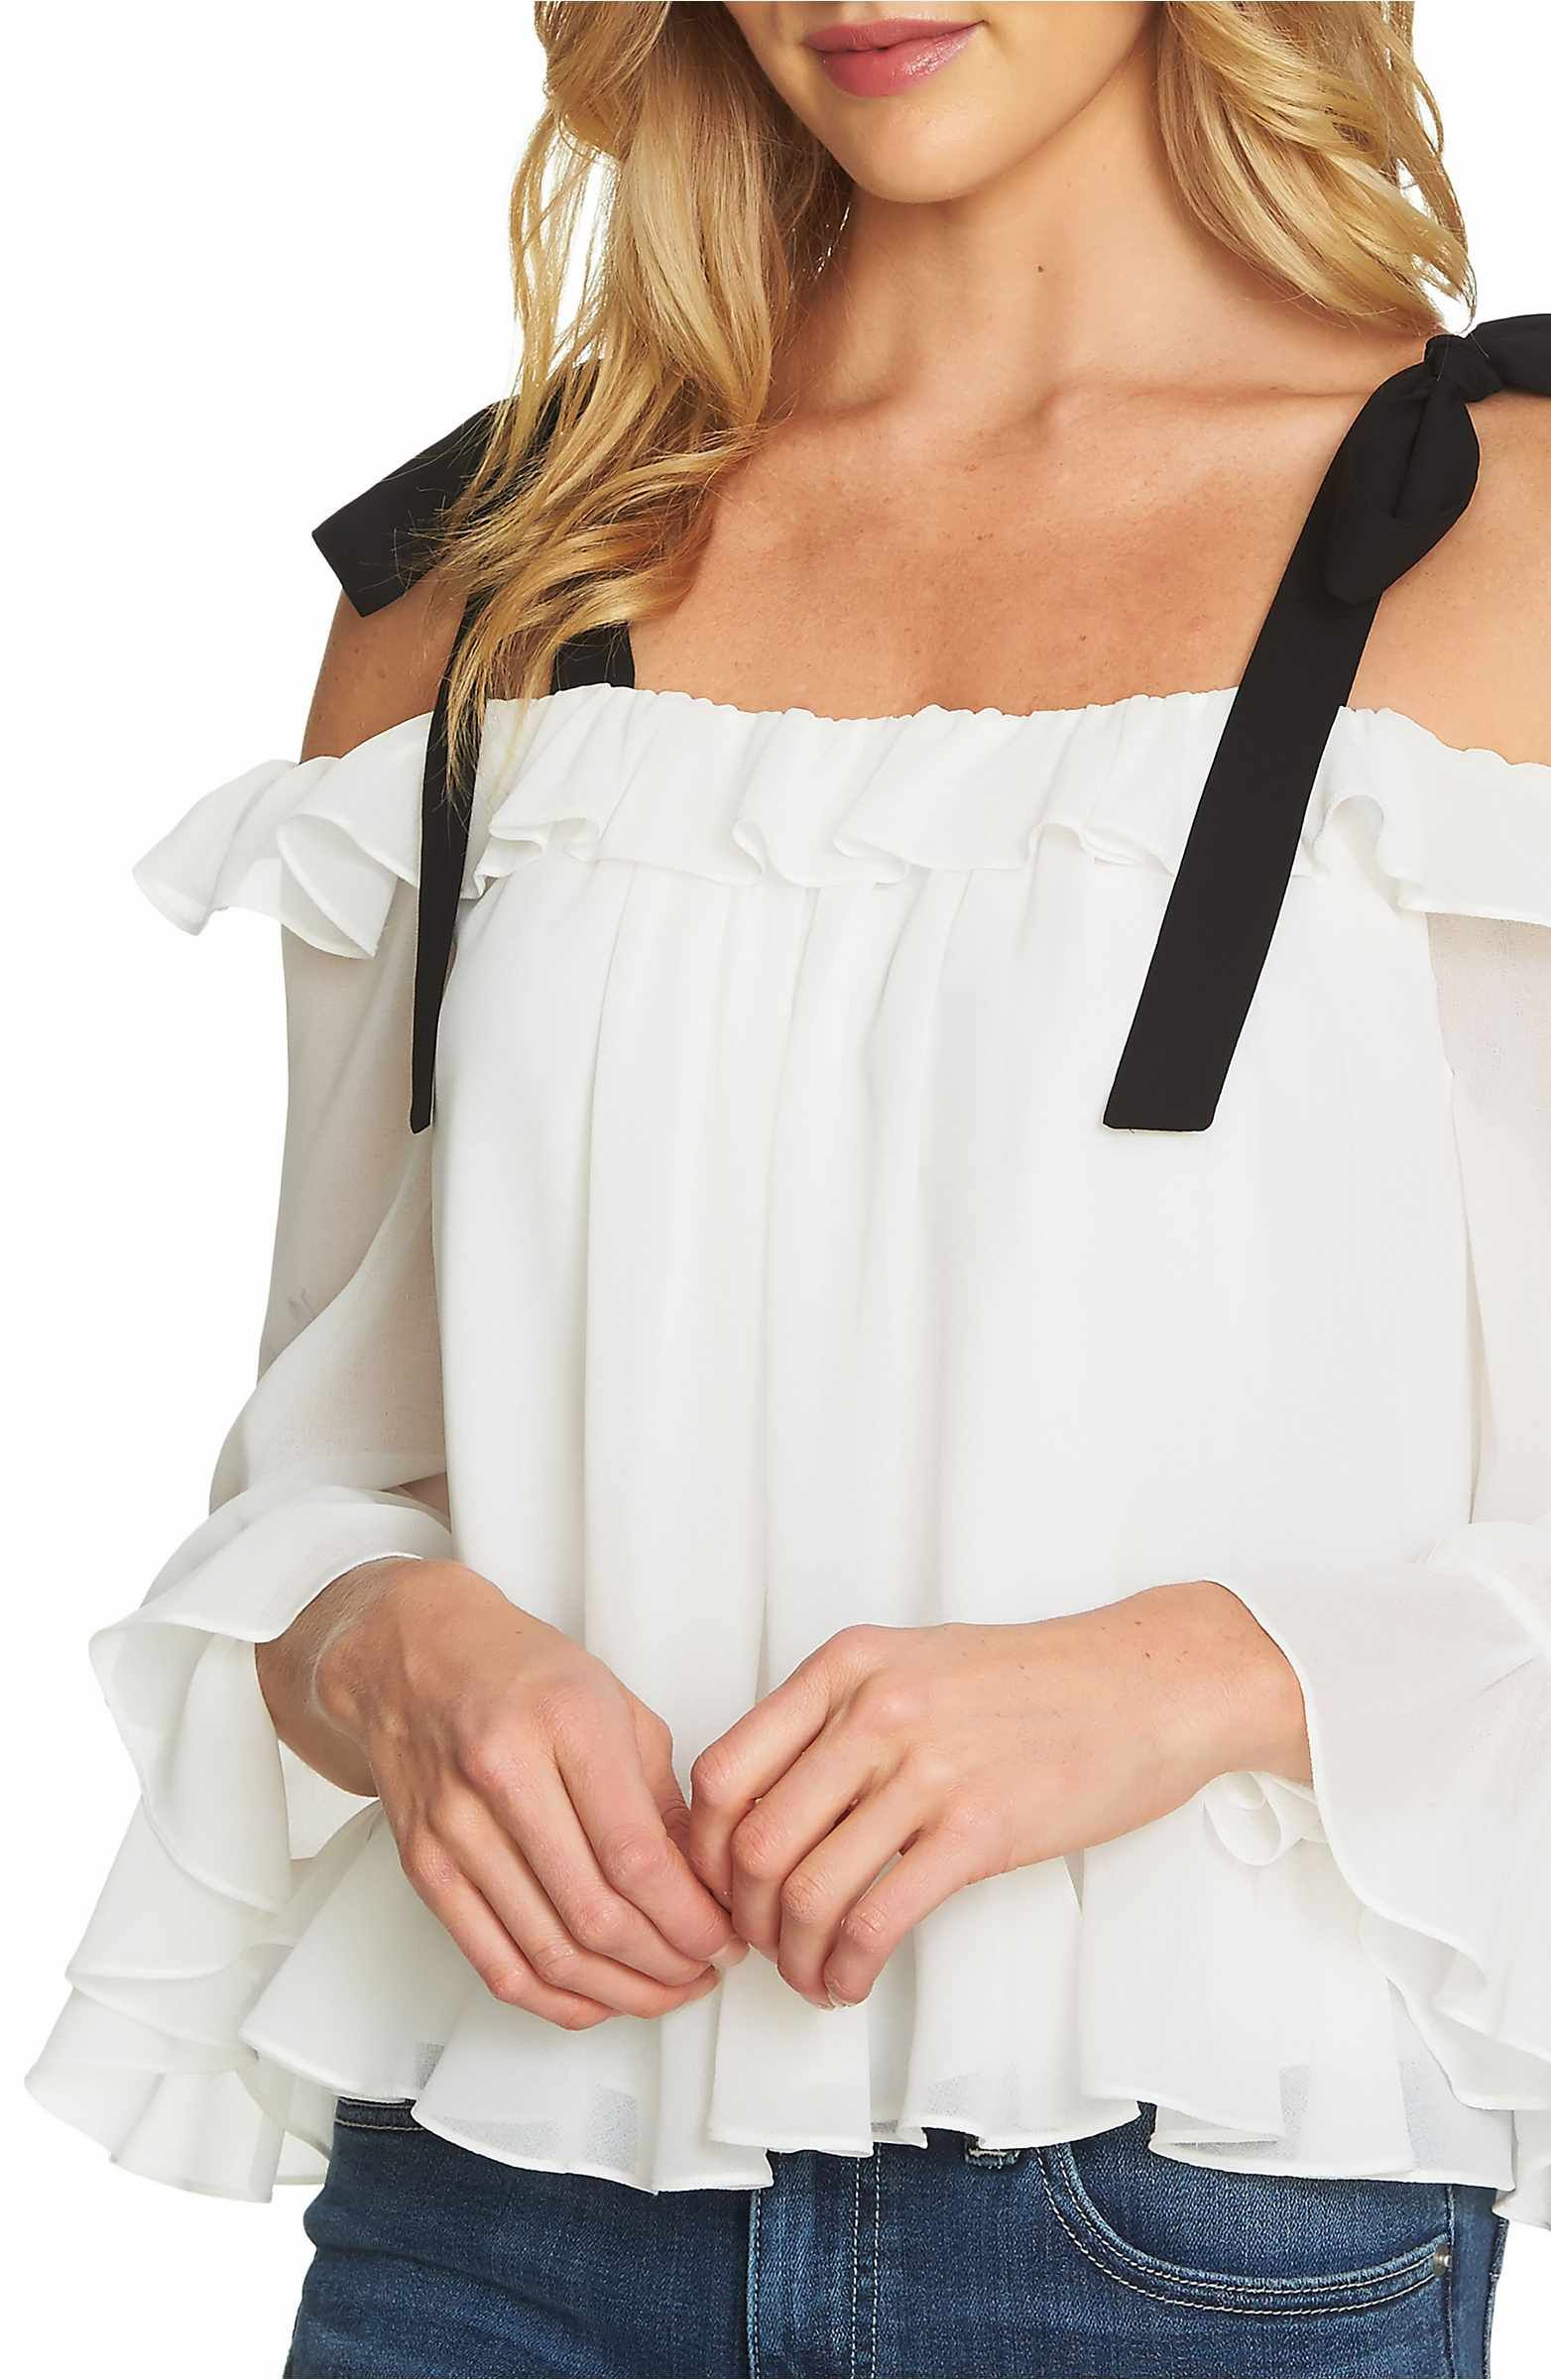 702f02680a6aca Main Image - CeCe Ruffled Tie-Shoulder Blouse | Clothes | Blouse ...